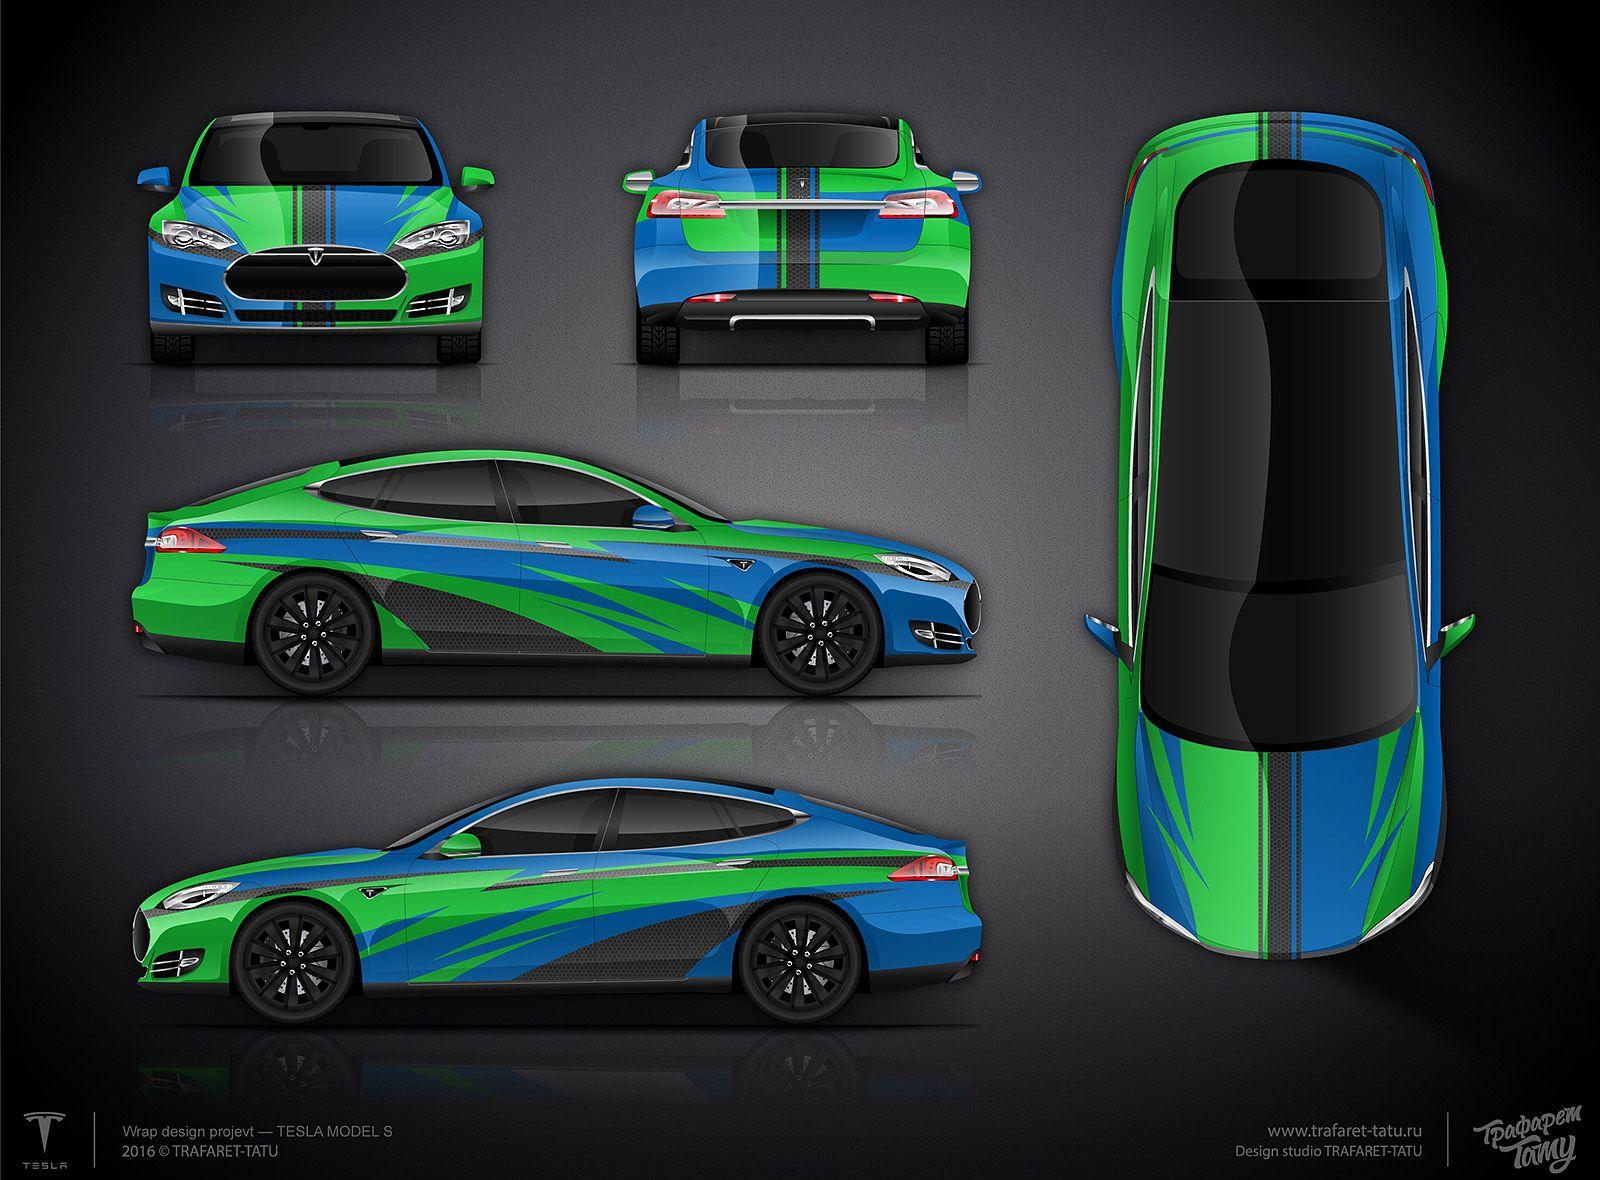 Design car wrap - The Approved Knifeless Car Wrap Design For Tesla S